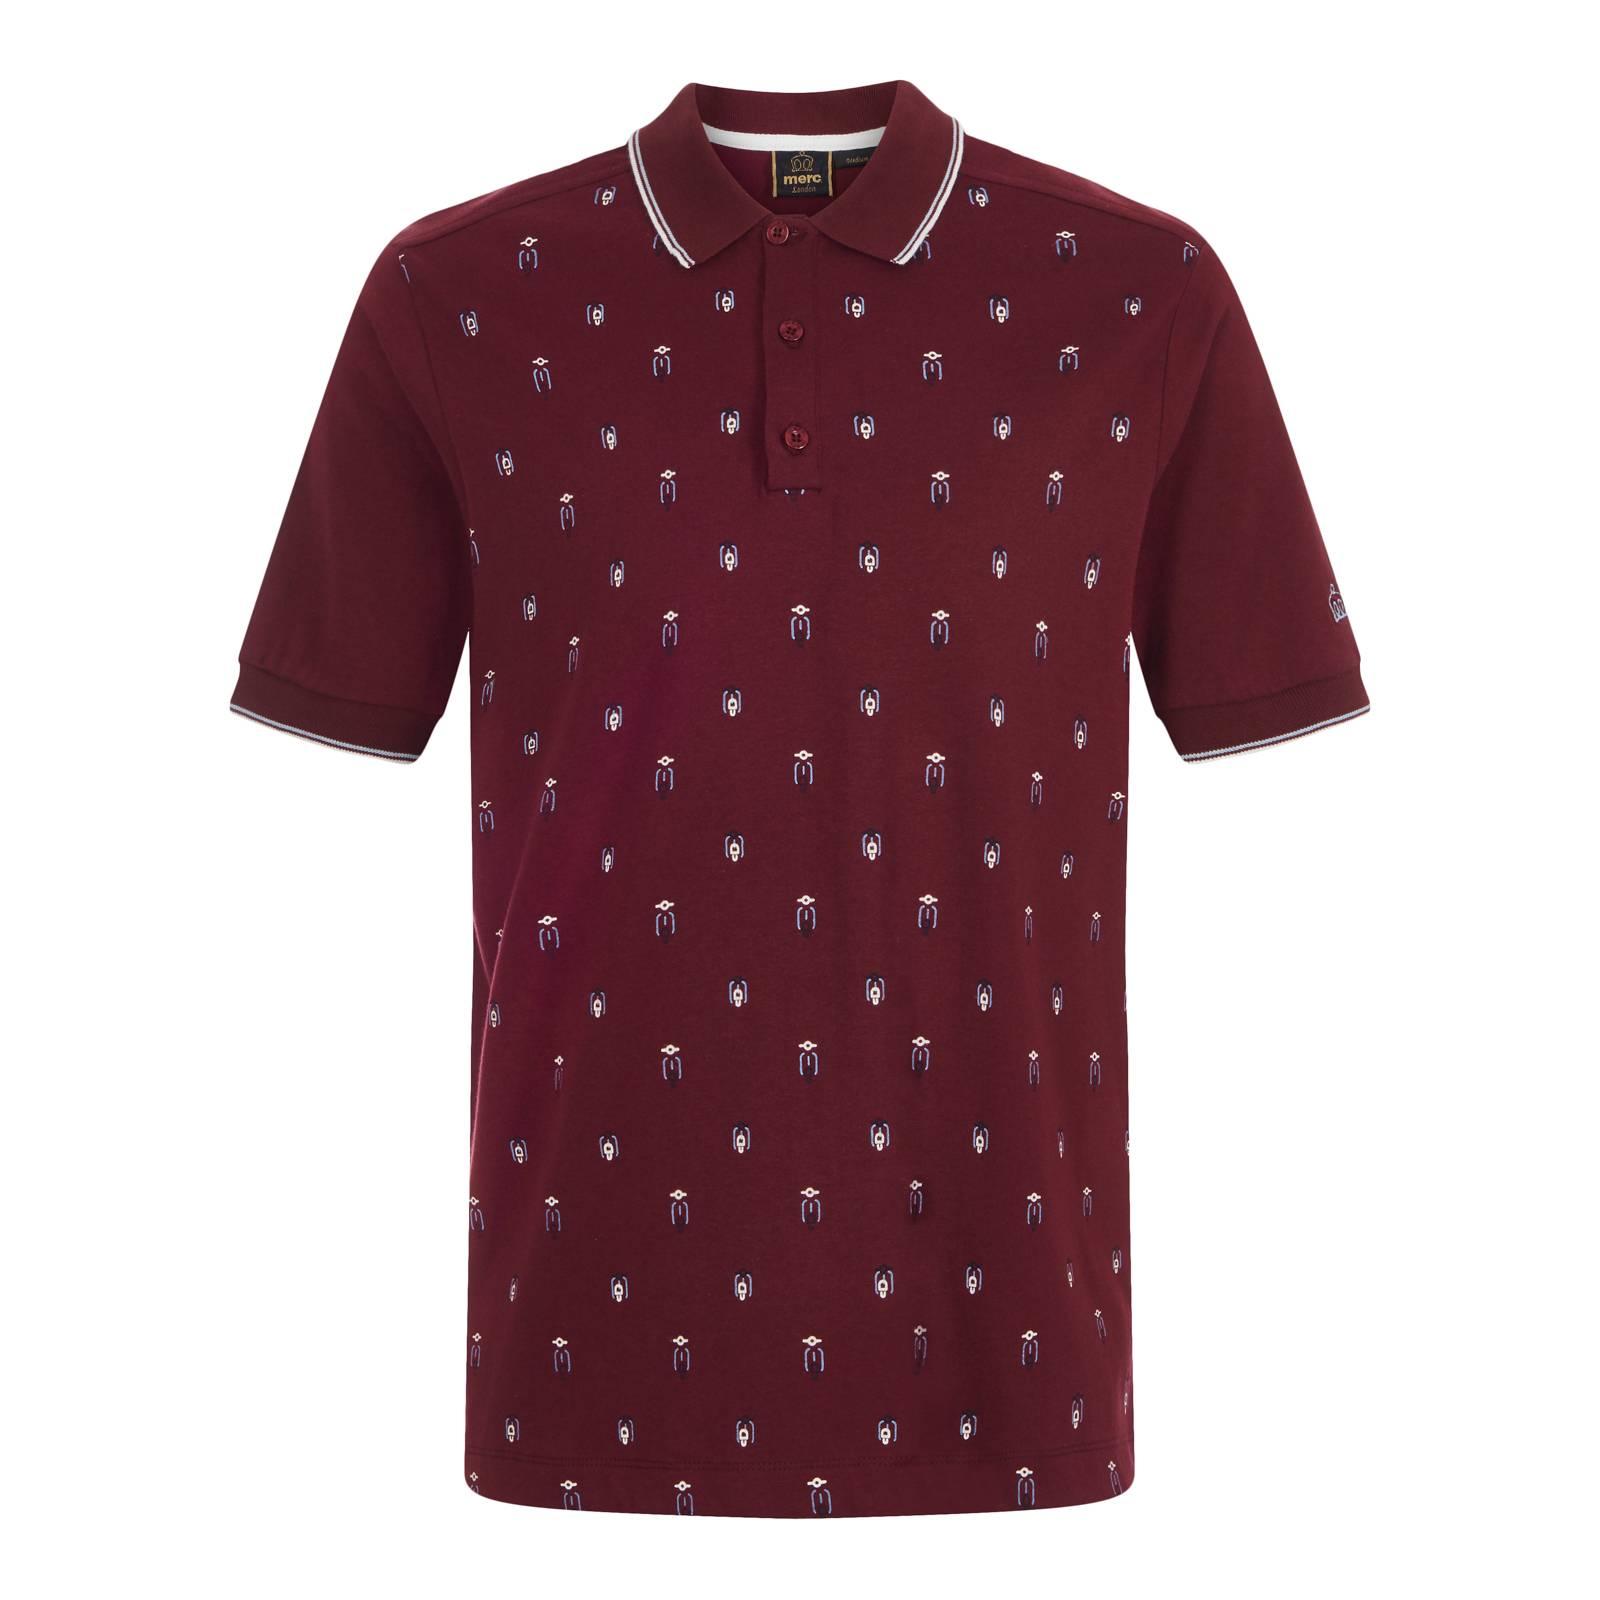 Рубашка Поло FitchПоло<br><br><br>Артикул: 1917112<br>Материал: 100% хлопок<br>Цвет: бурый<br>Пол: Мужской